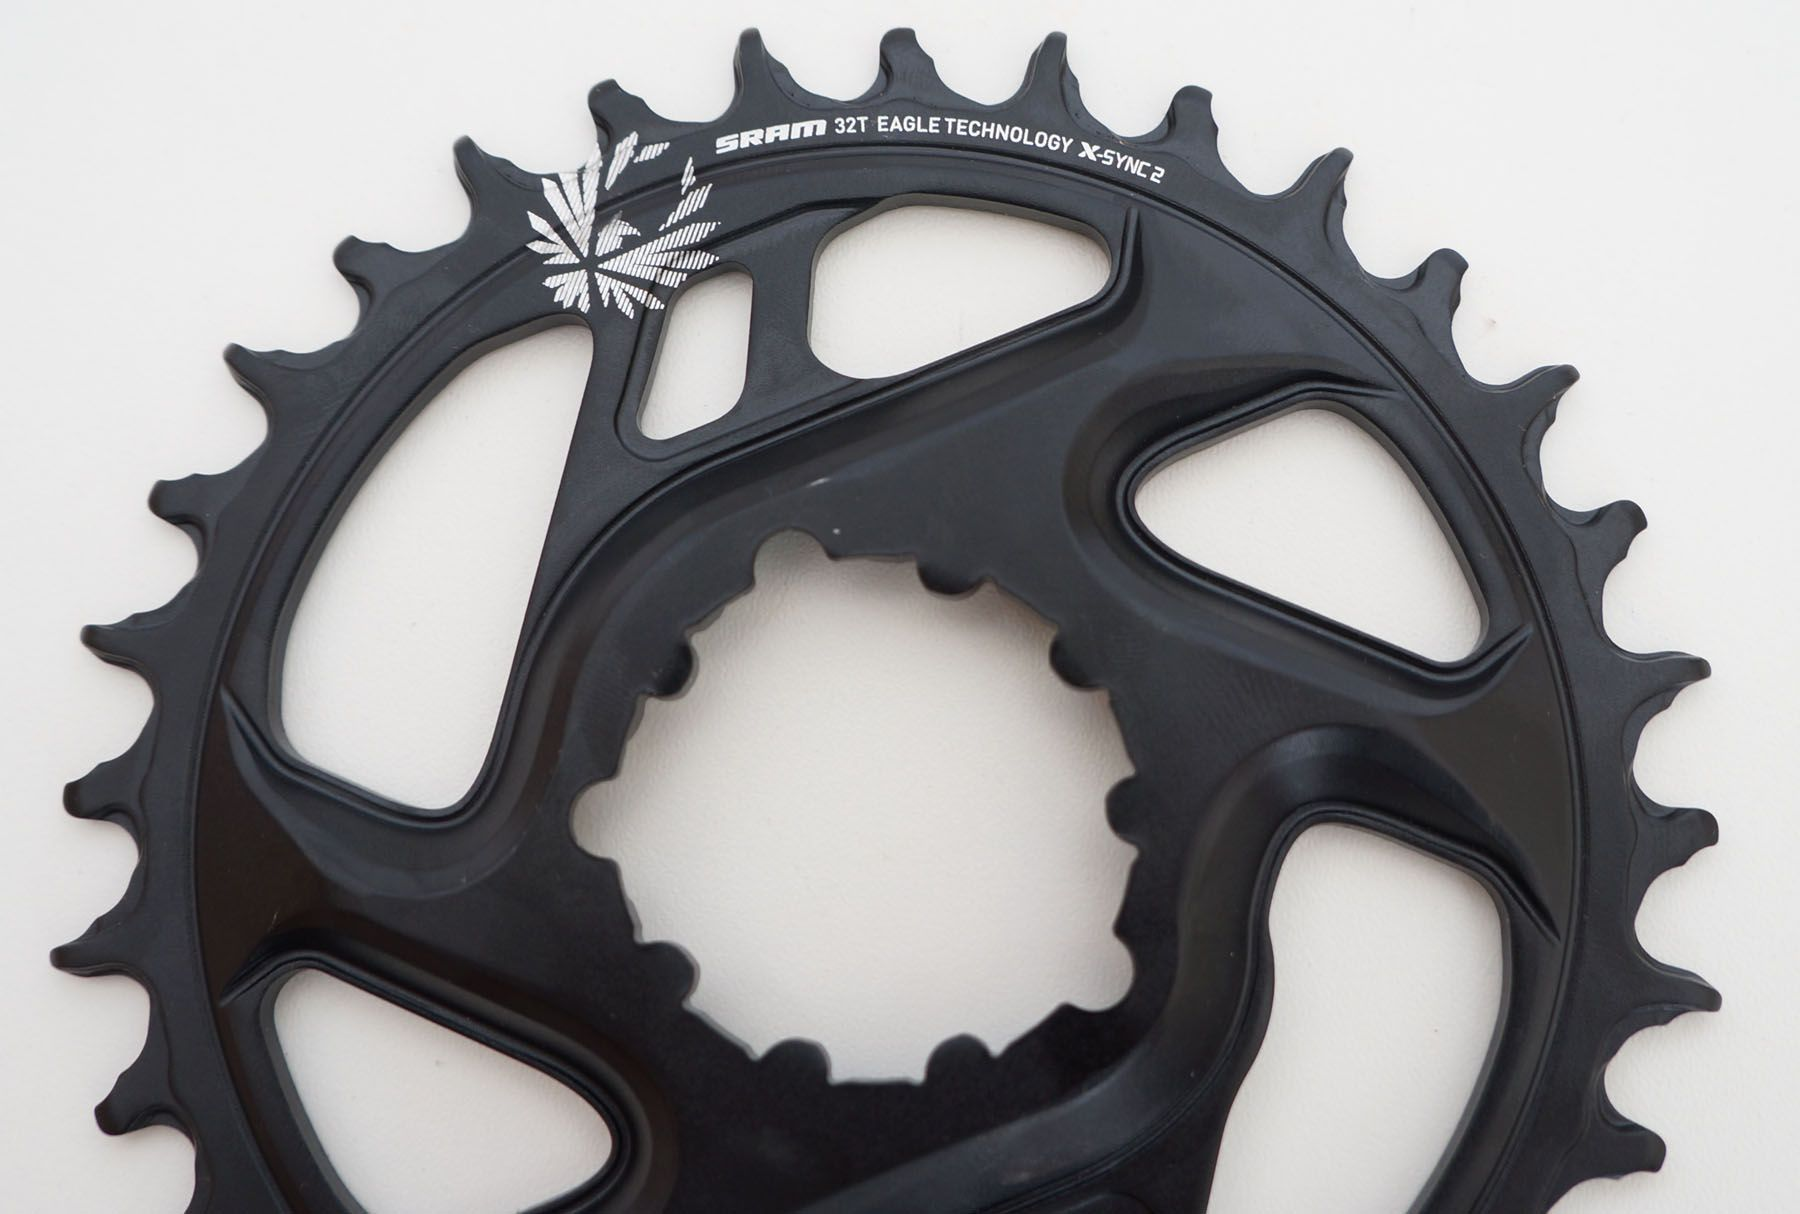 Coroa Bicicleta Sram GX Eagle 32t Preta Para Uso 1x12 Off set 6mm